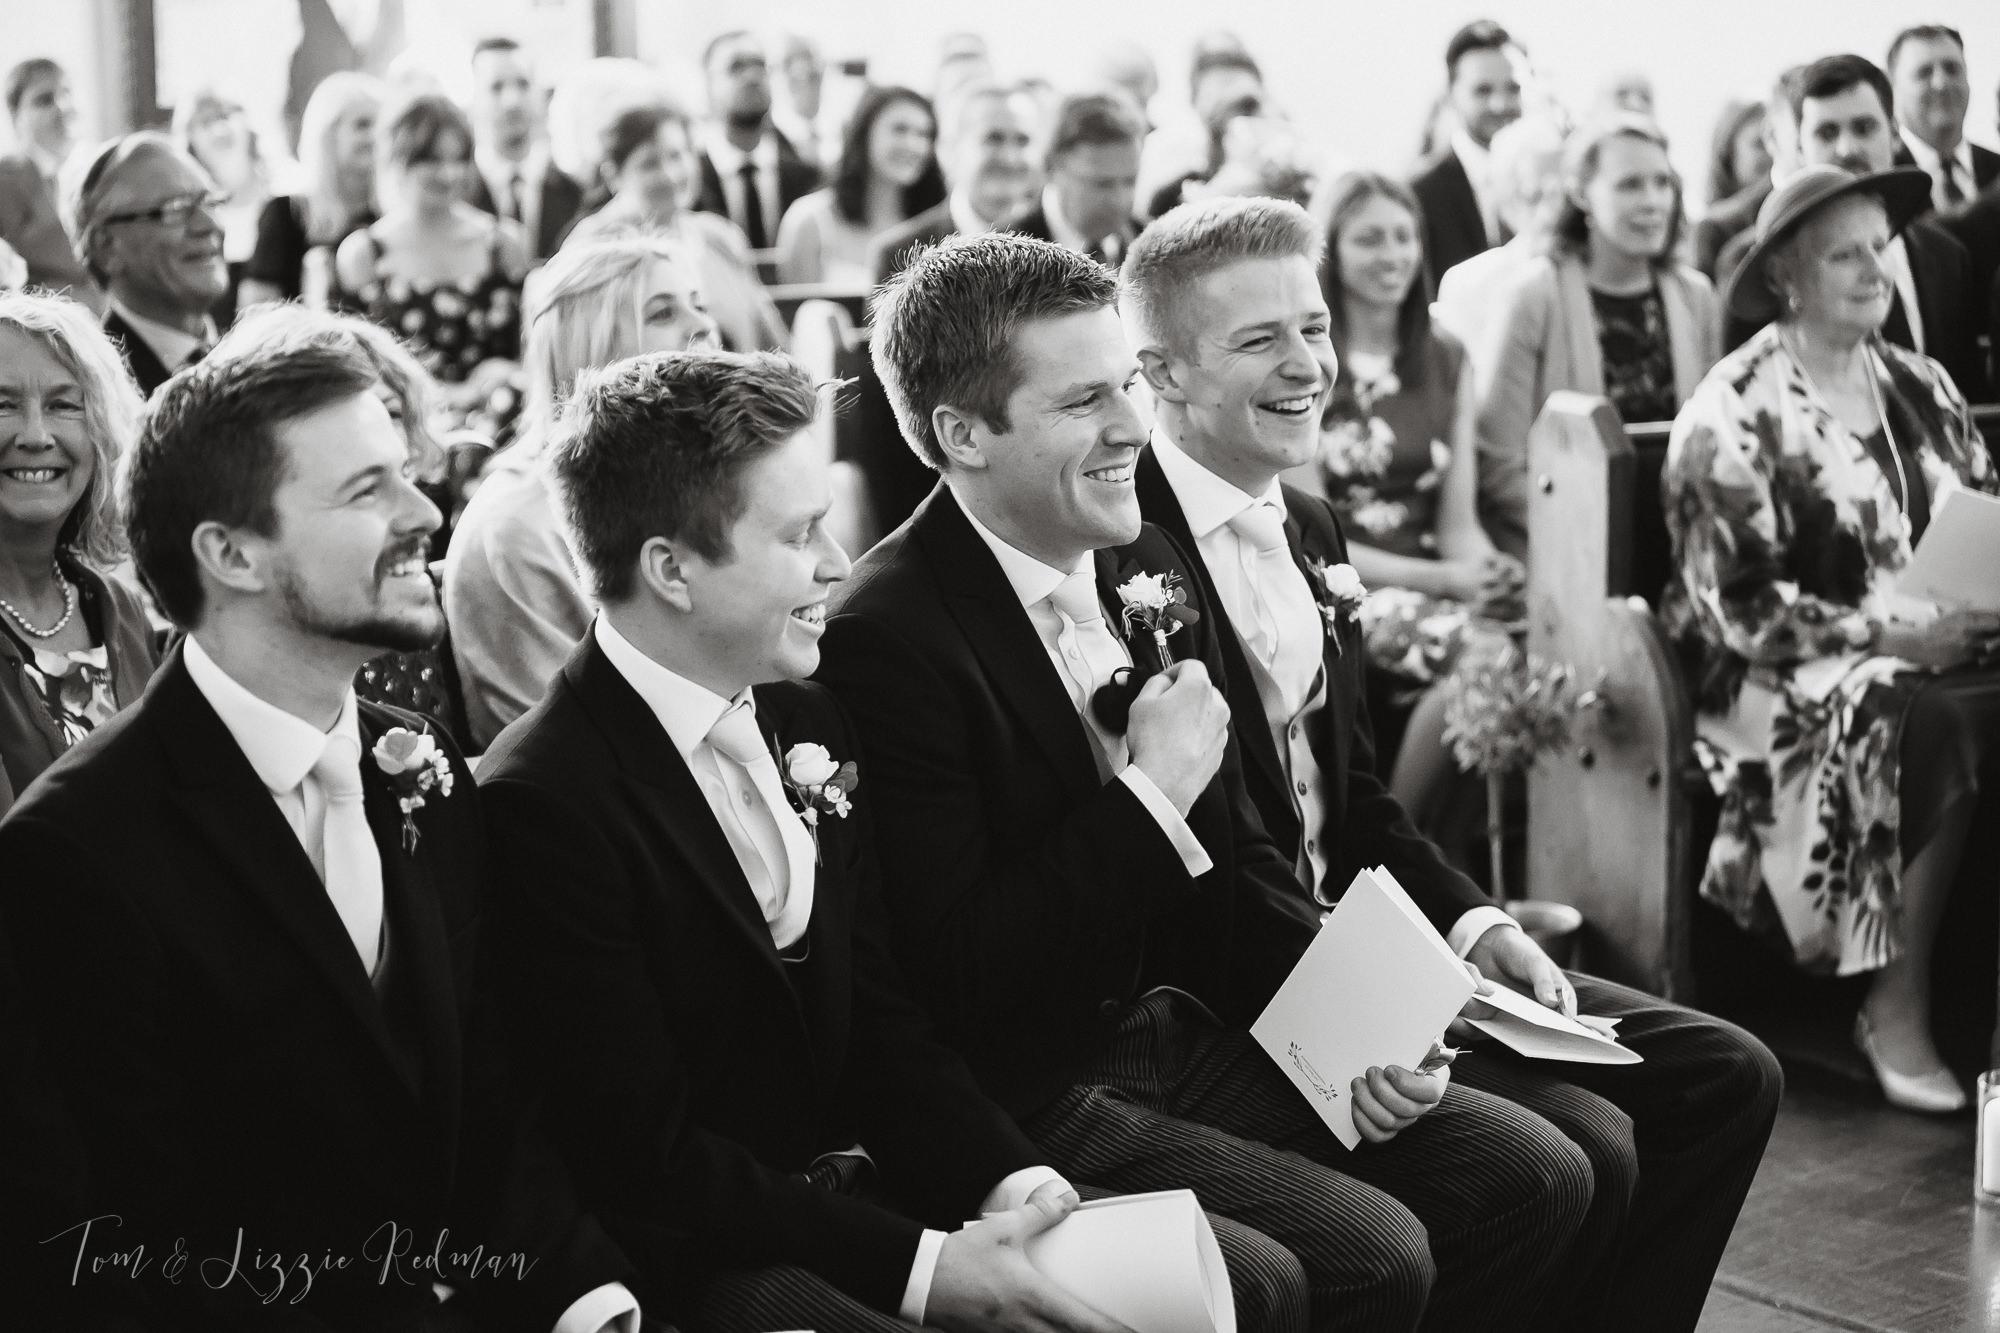 Dorset wedding photographers Tom & Lizzie Redman 019.jpg